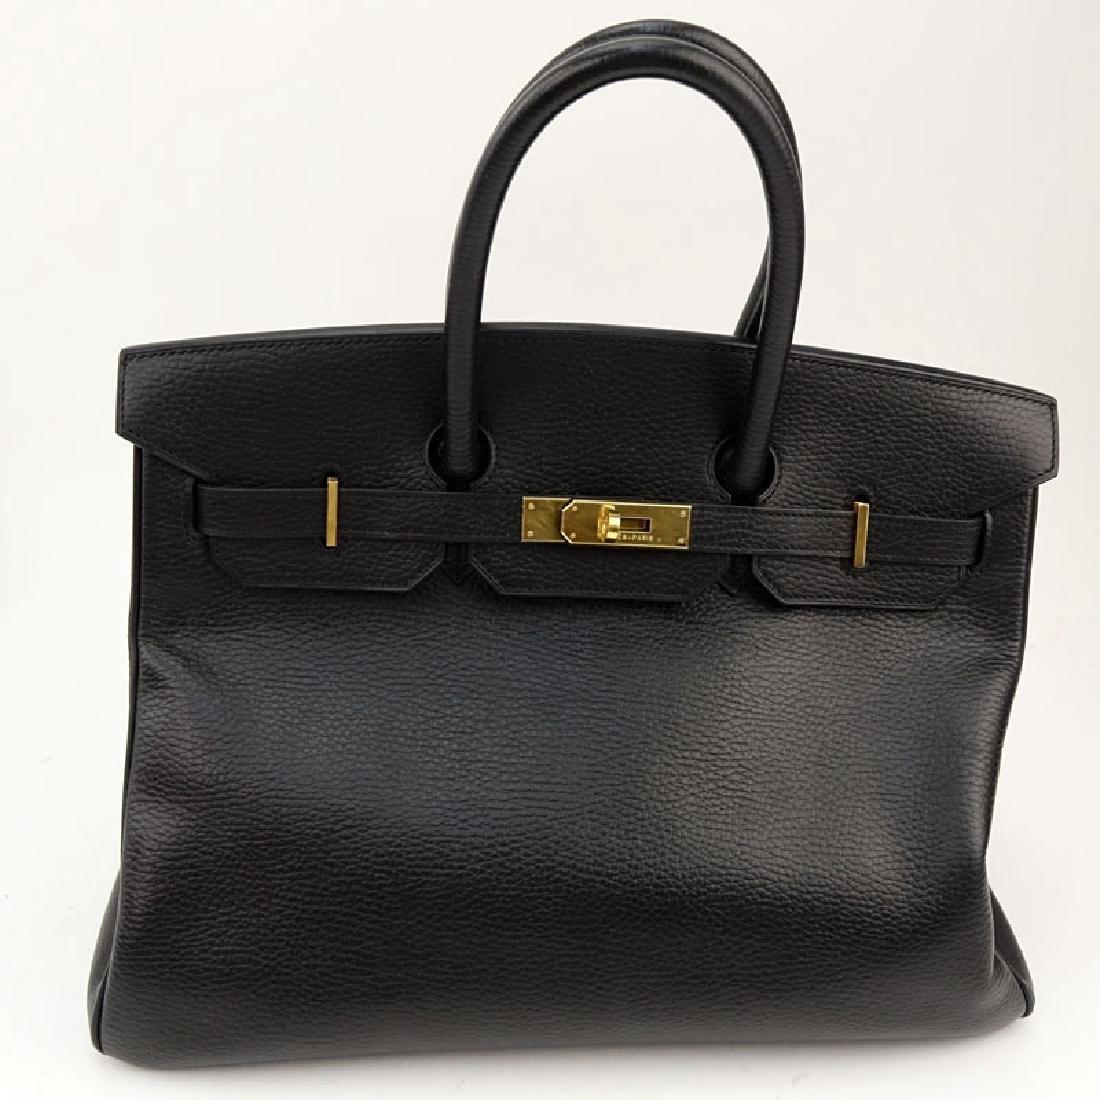 Hermès Black Noir Togo Leather Birkin GHW Bag 35 With